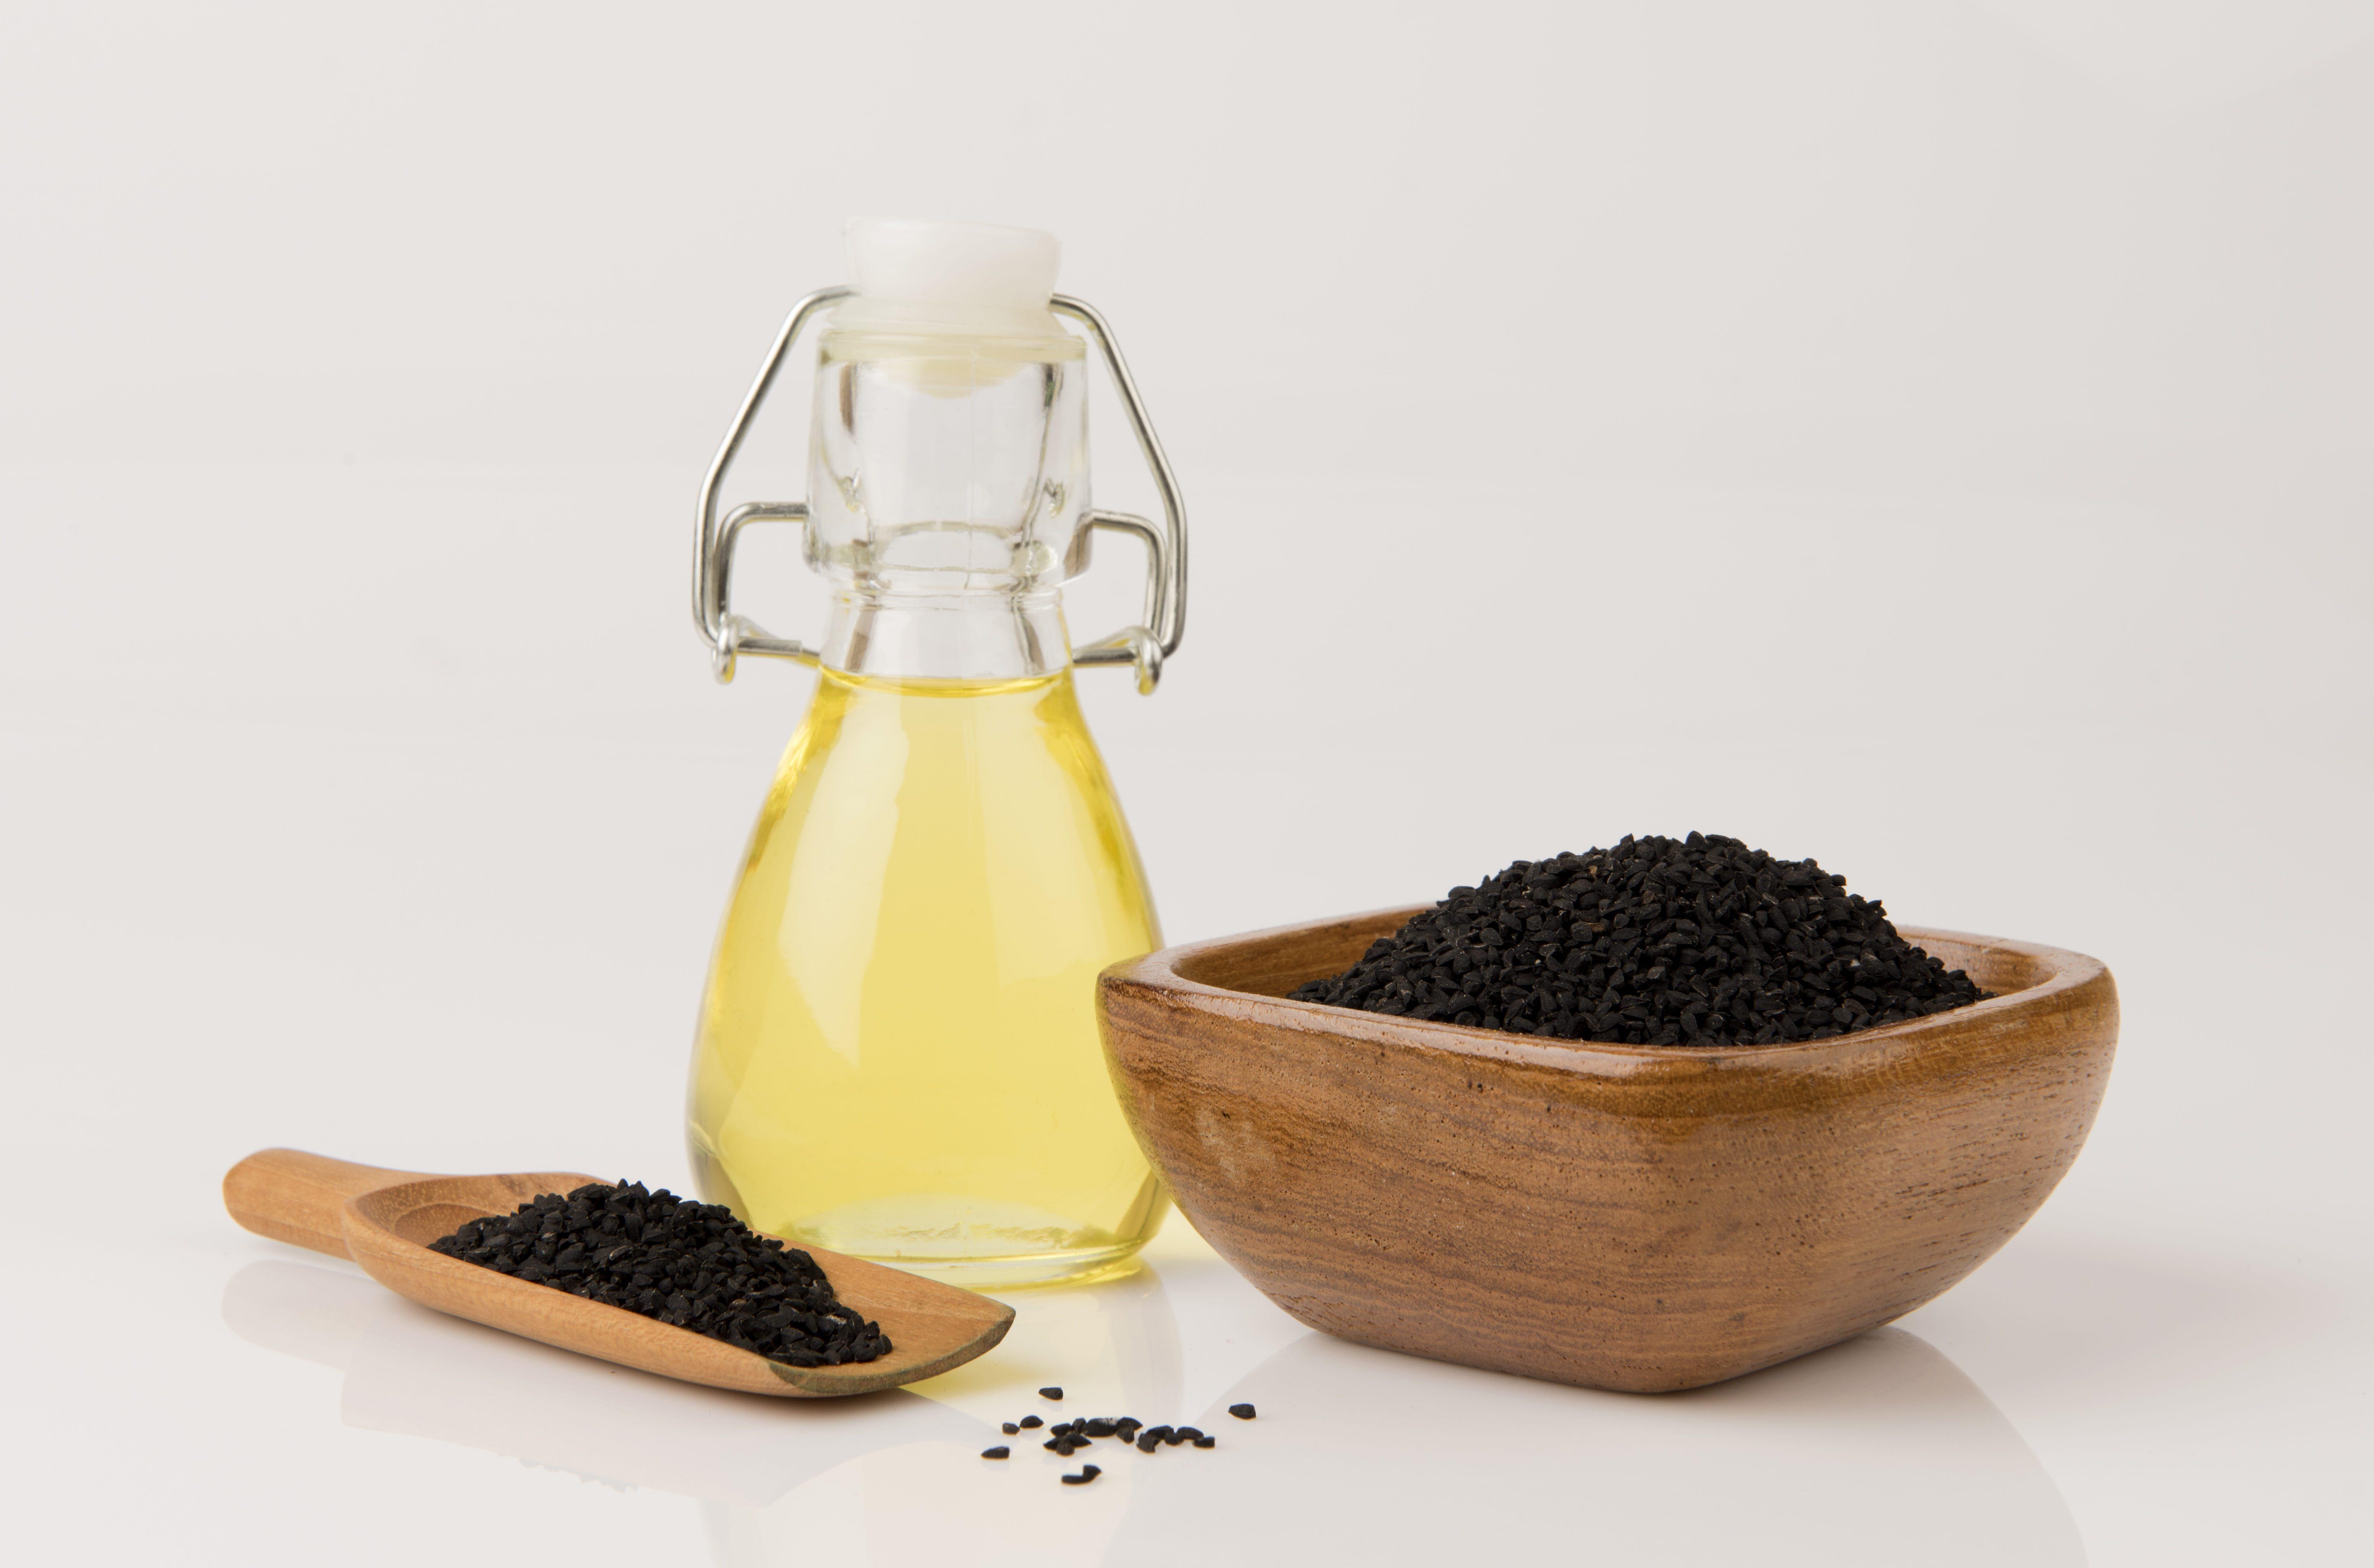 Nigella, Black Cumin, Black Caraway, Fennel flower, Nutmeg flower, Love in the mist, Roman coriander, Wild onion seed (Nigella sativa L.) oil and seeds.